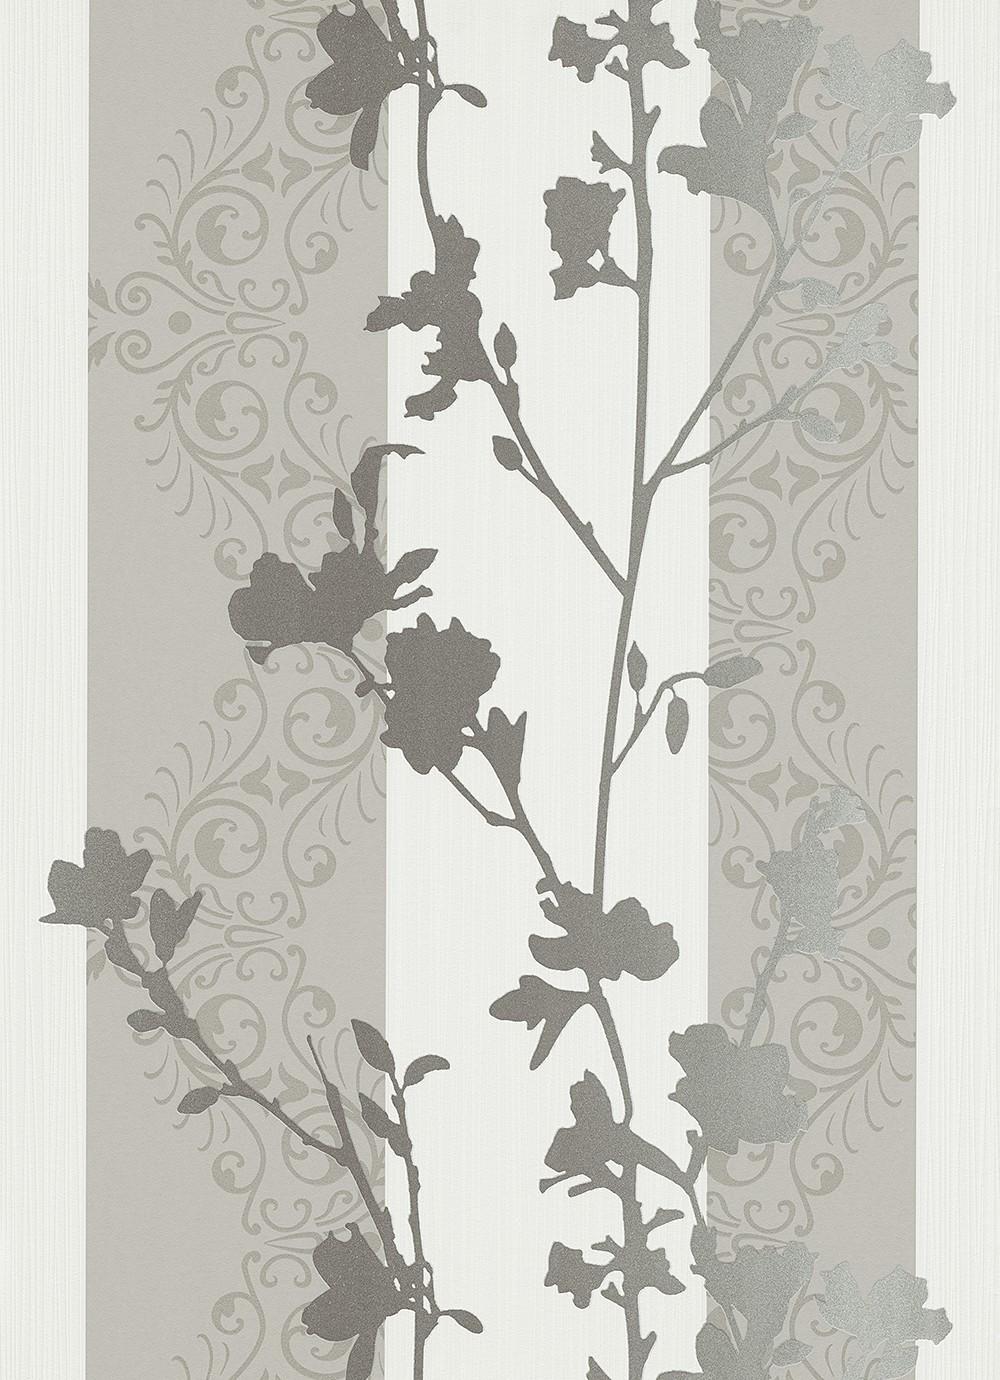 vliestapete ranken wei silber tapeten vertiko neo. Black Bedroom Furniture Sets. Home Design Ideas